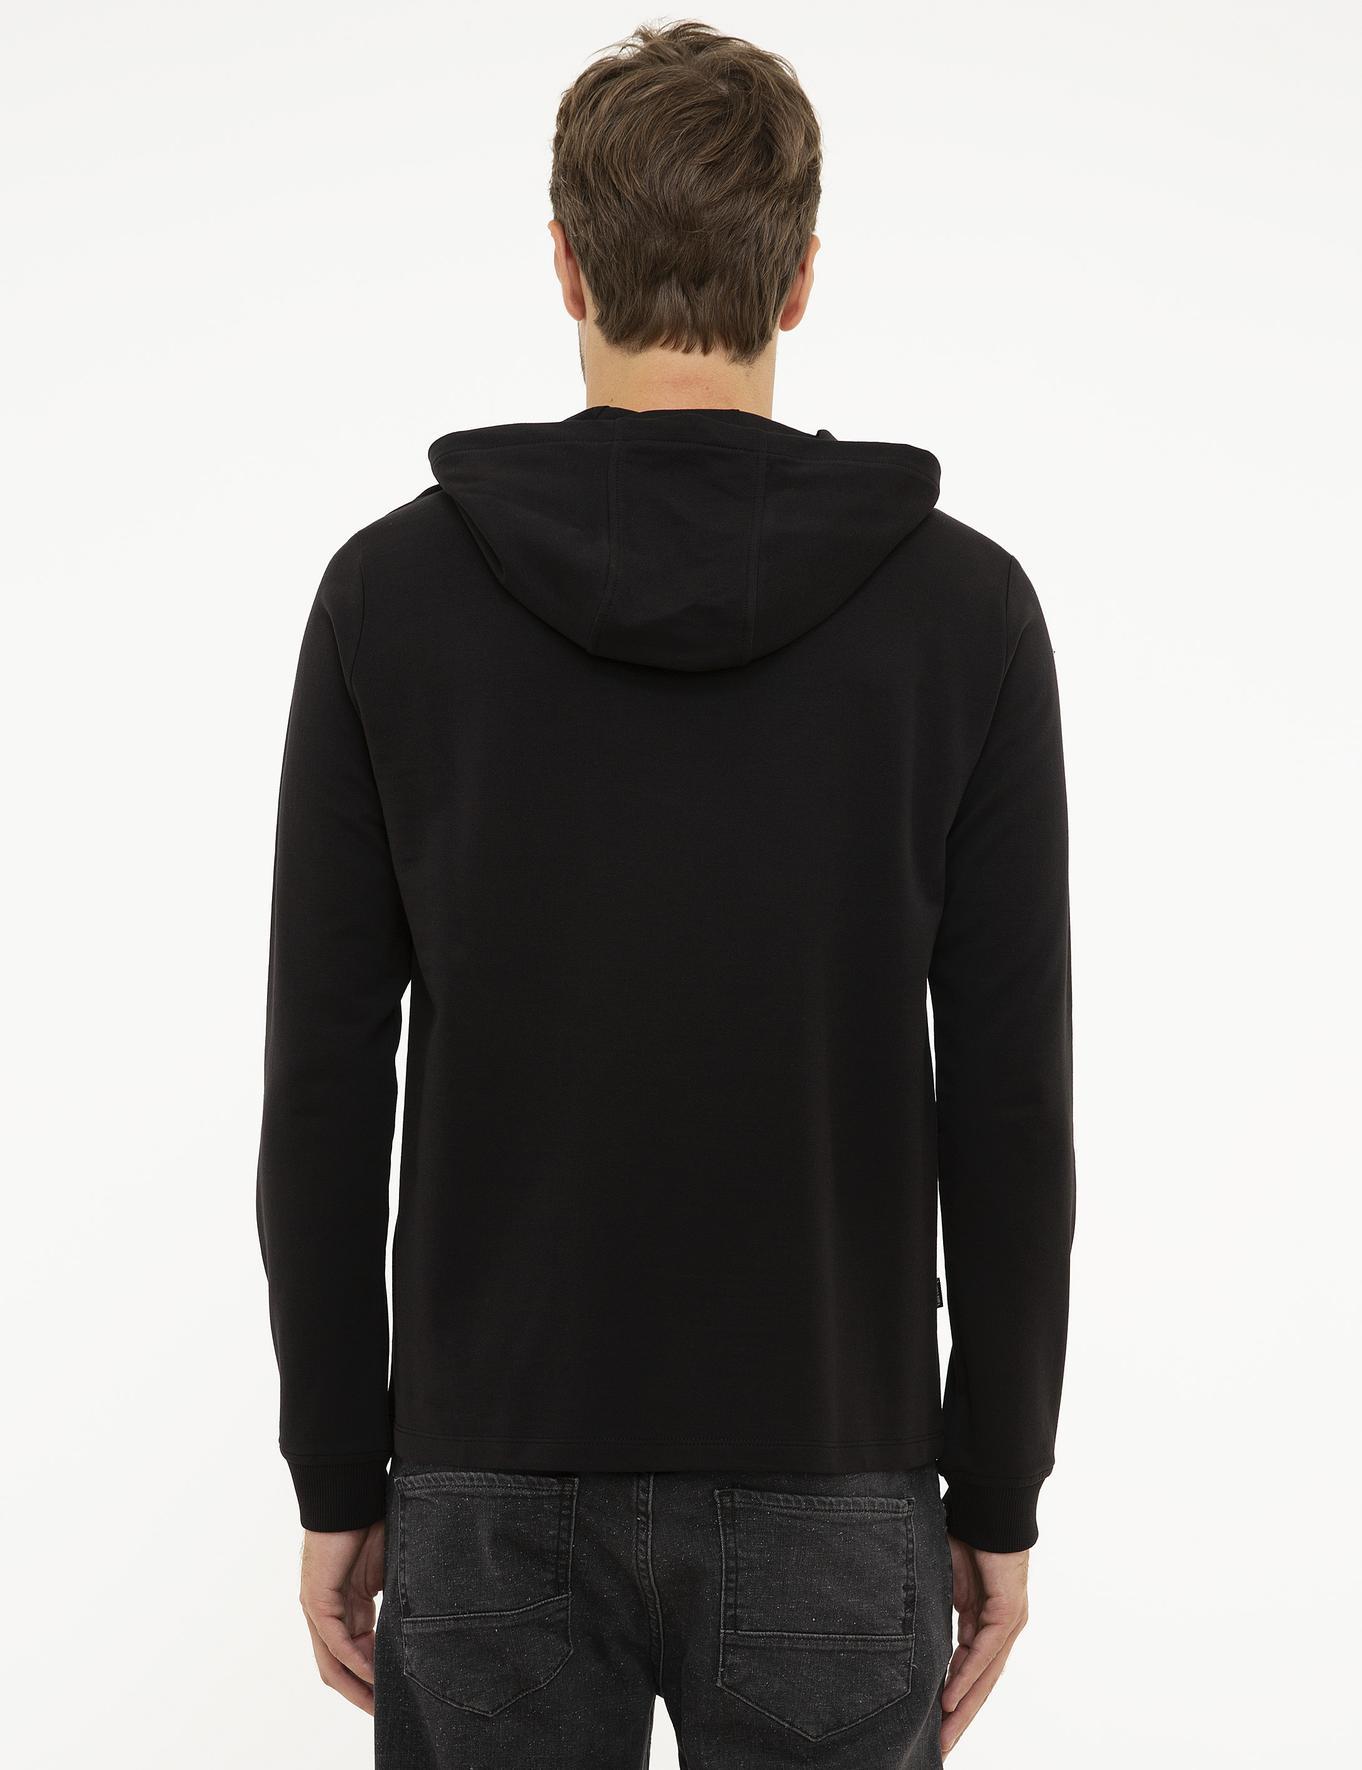 Siyah Standart Fit Sweatshirt